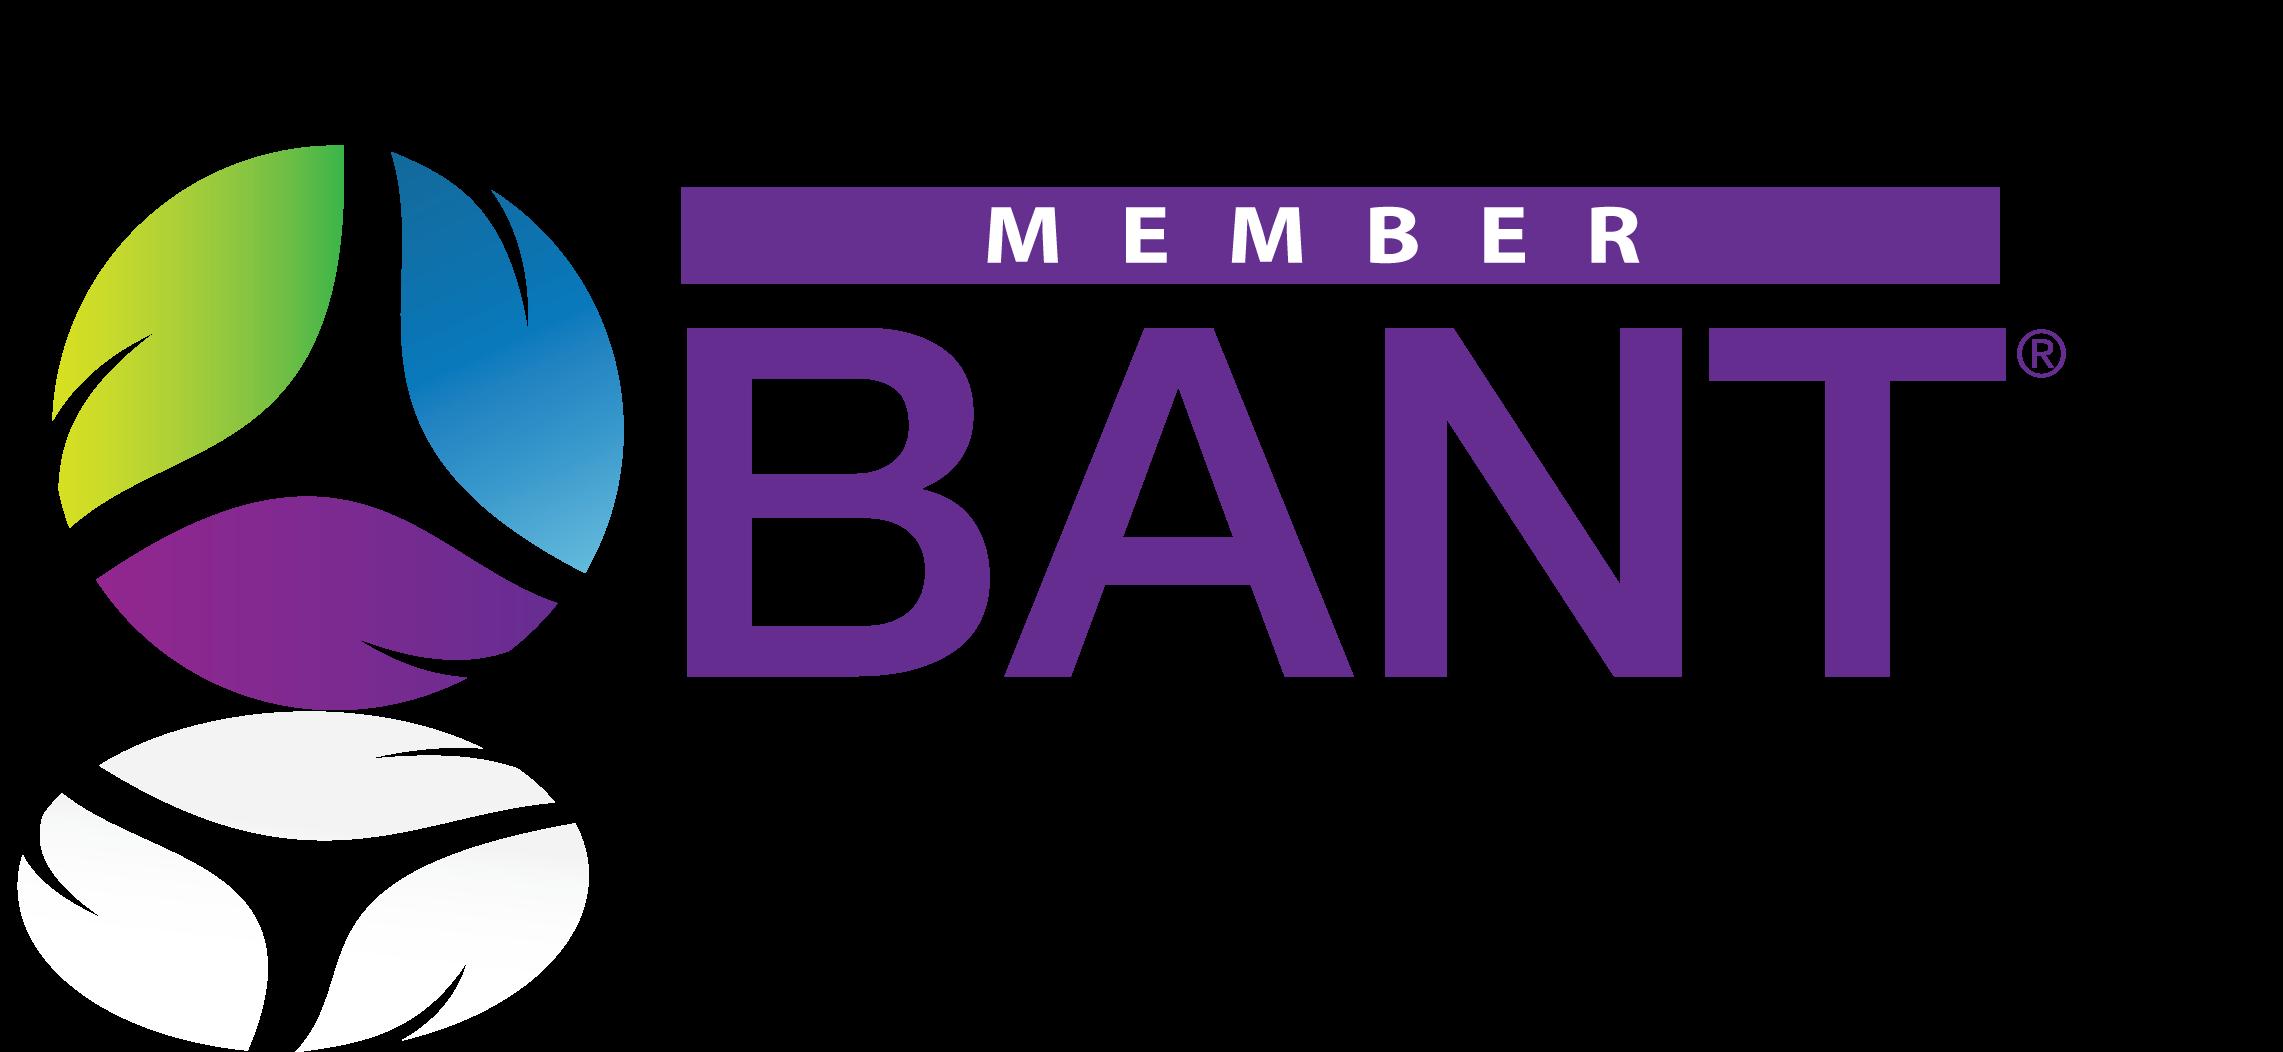 bant-member-logo-larger.png